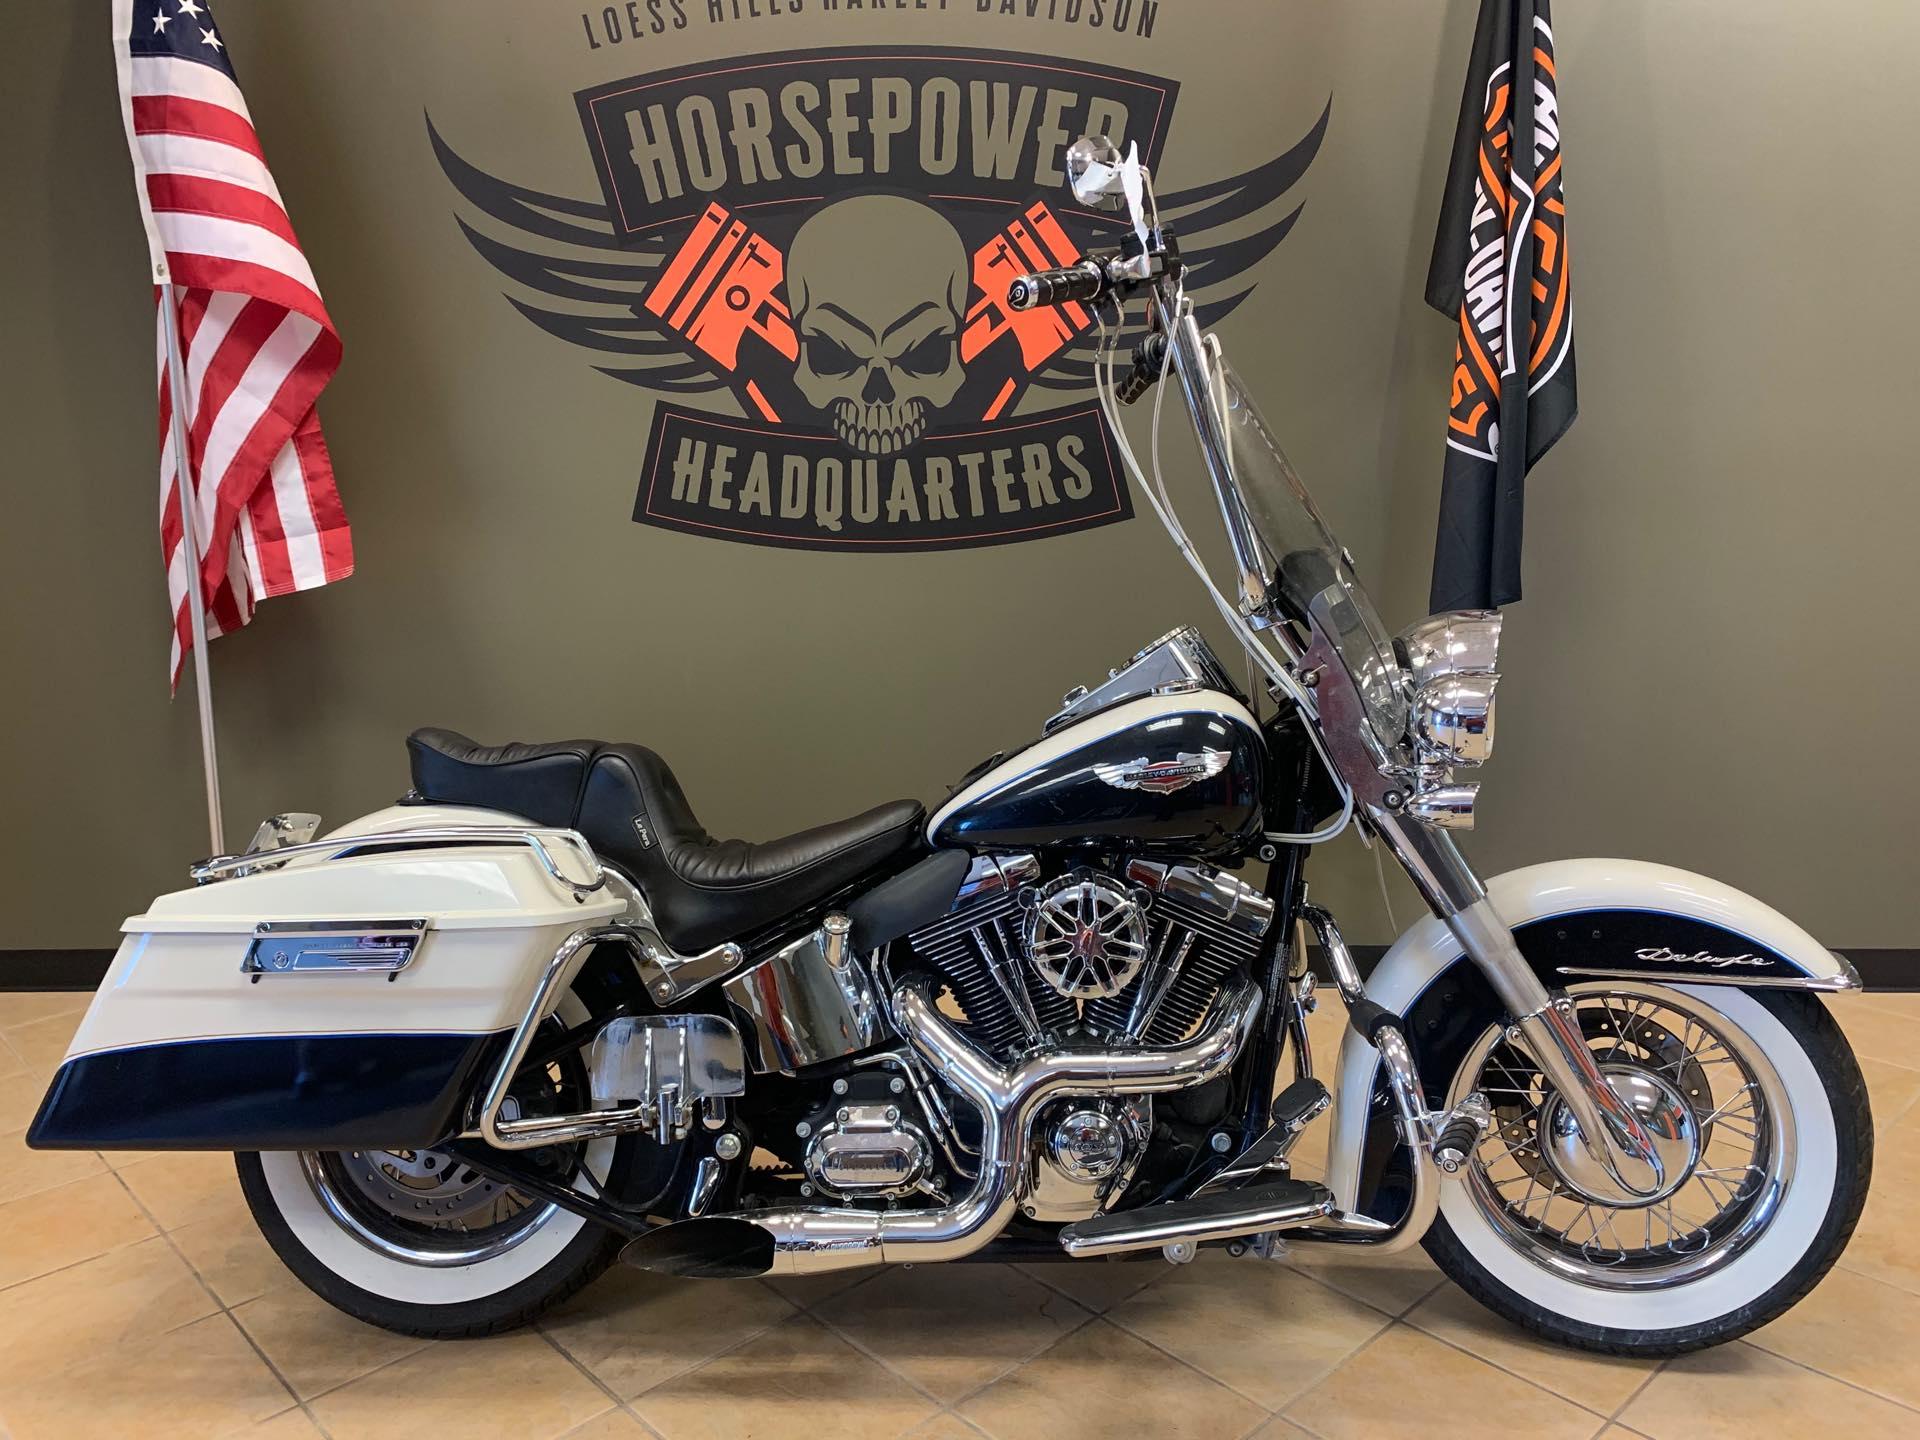 2013 Harley-Davidson Softail Deluxe at Loess Hills Harley-Davidson